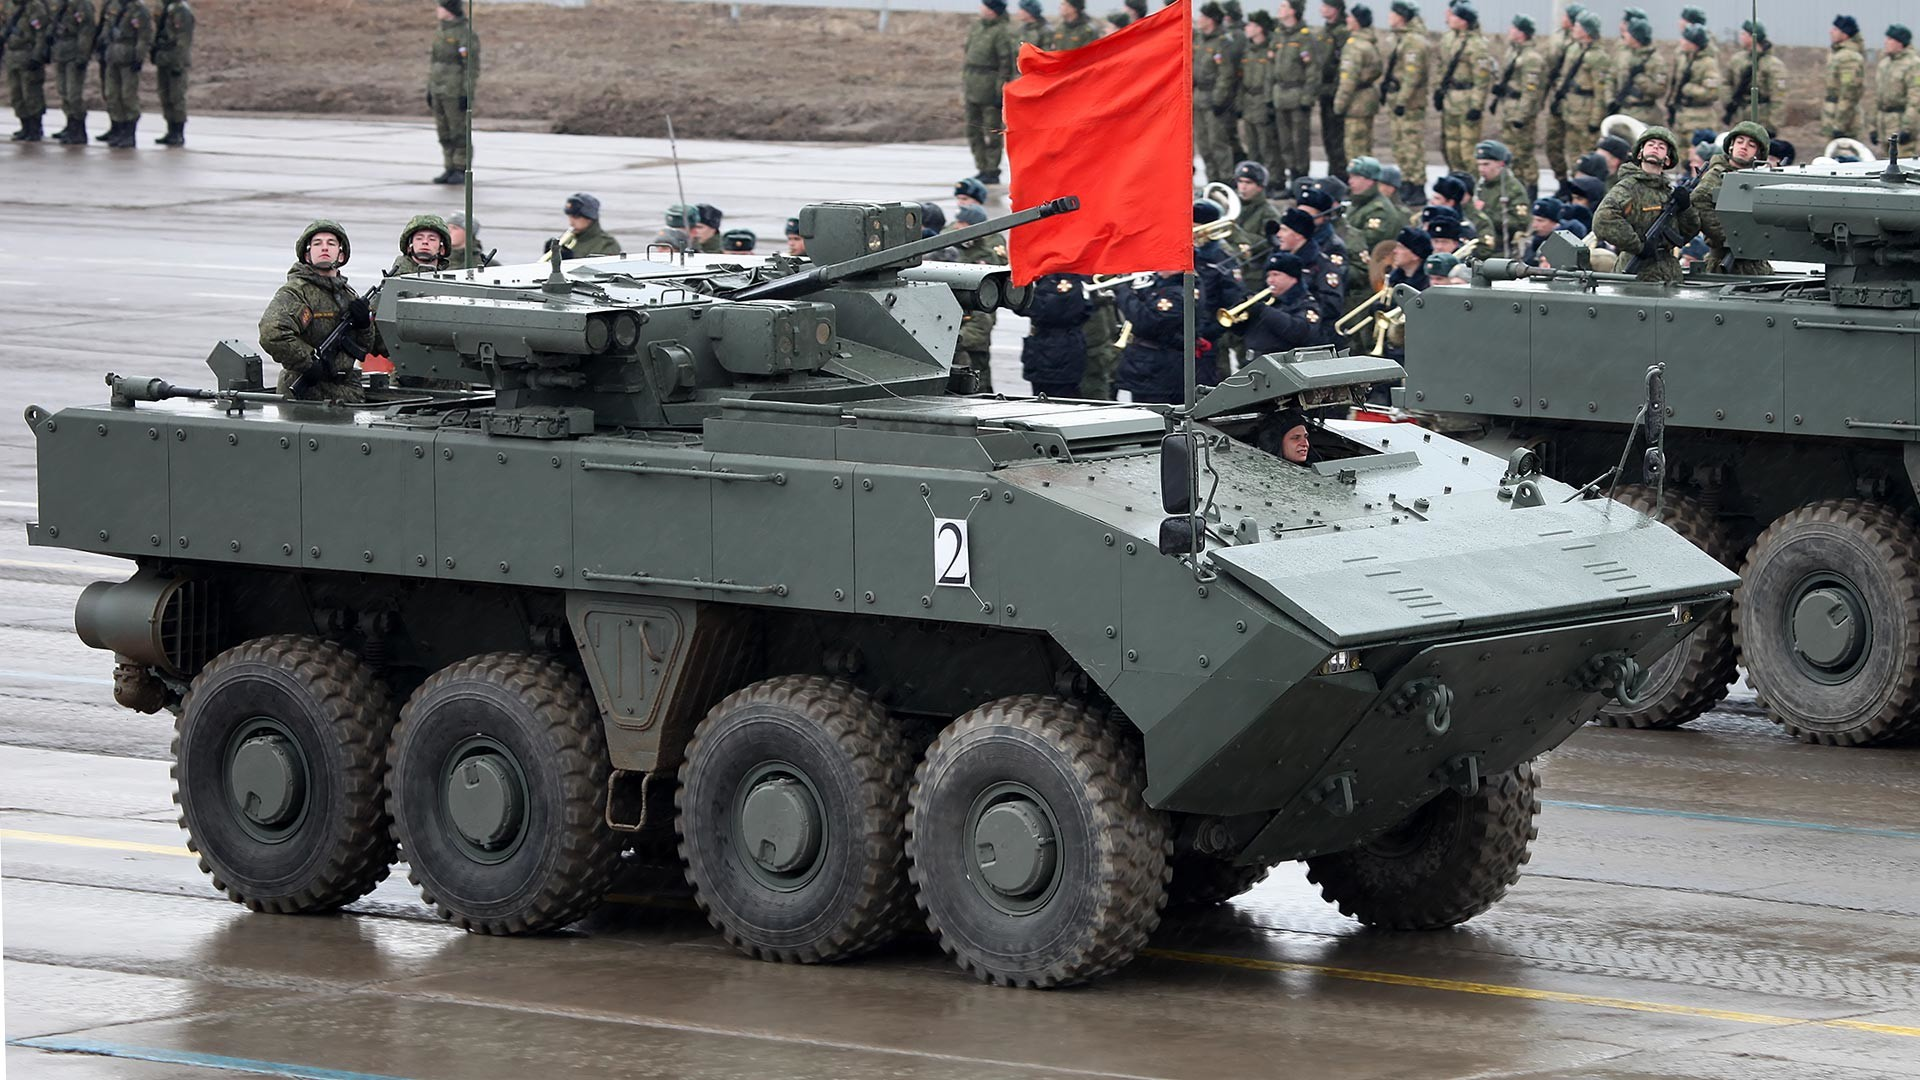 BMP-К К-17 VPK-7829 Boomerang